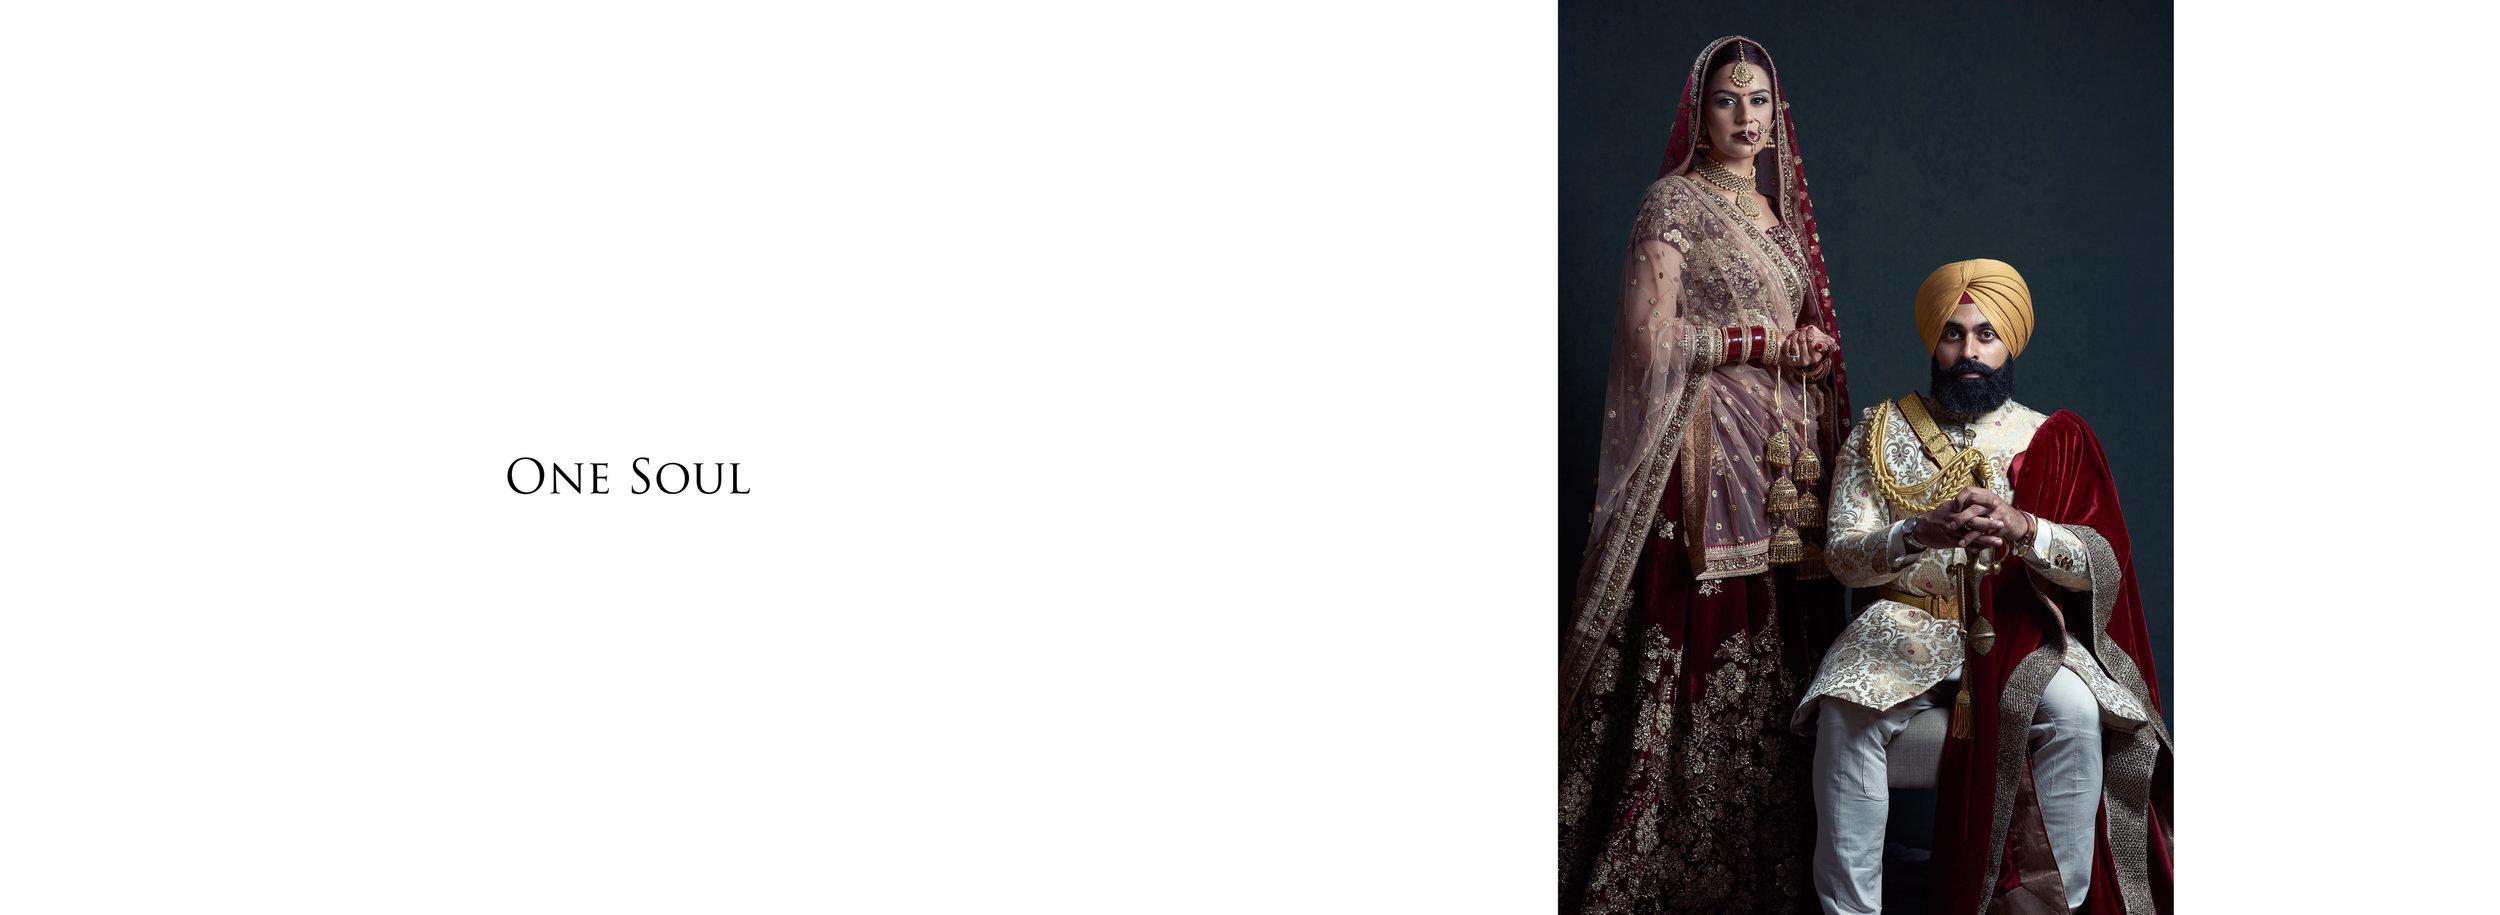 Sikh Wedding Album spread 1 - Couple portrait